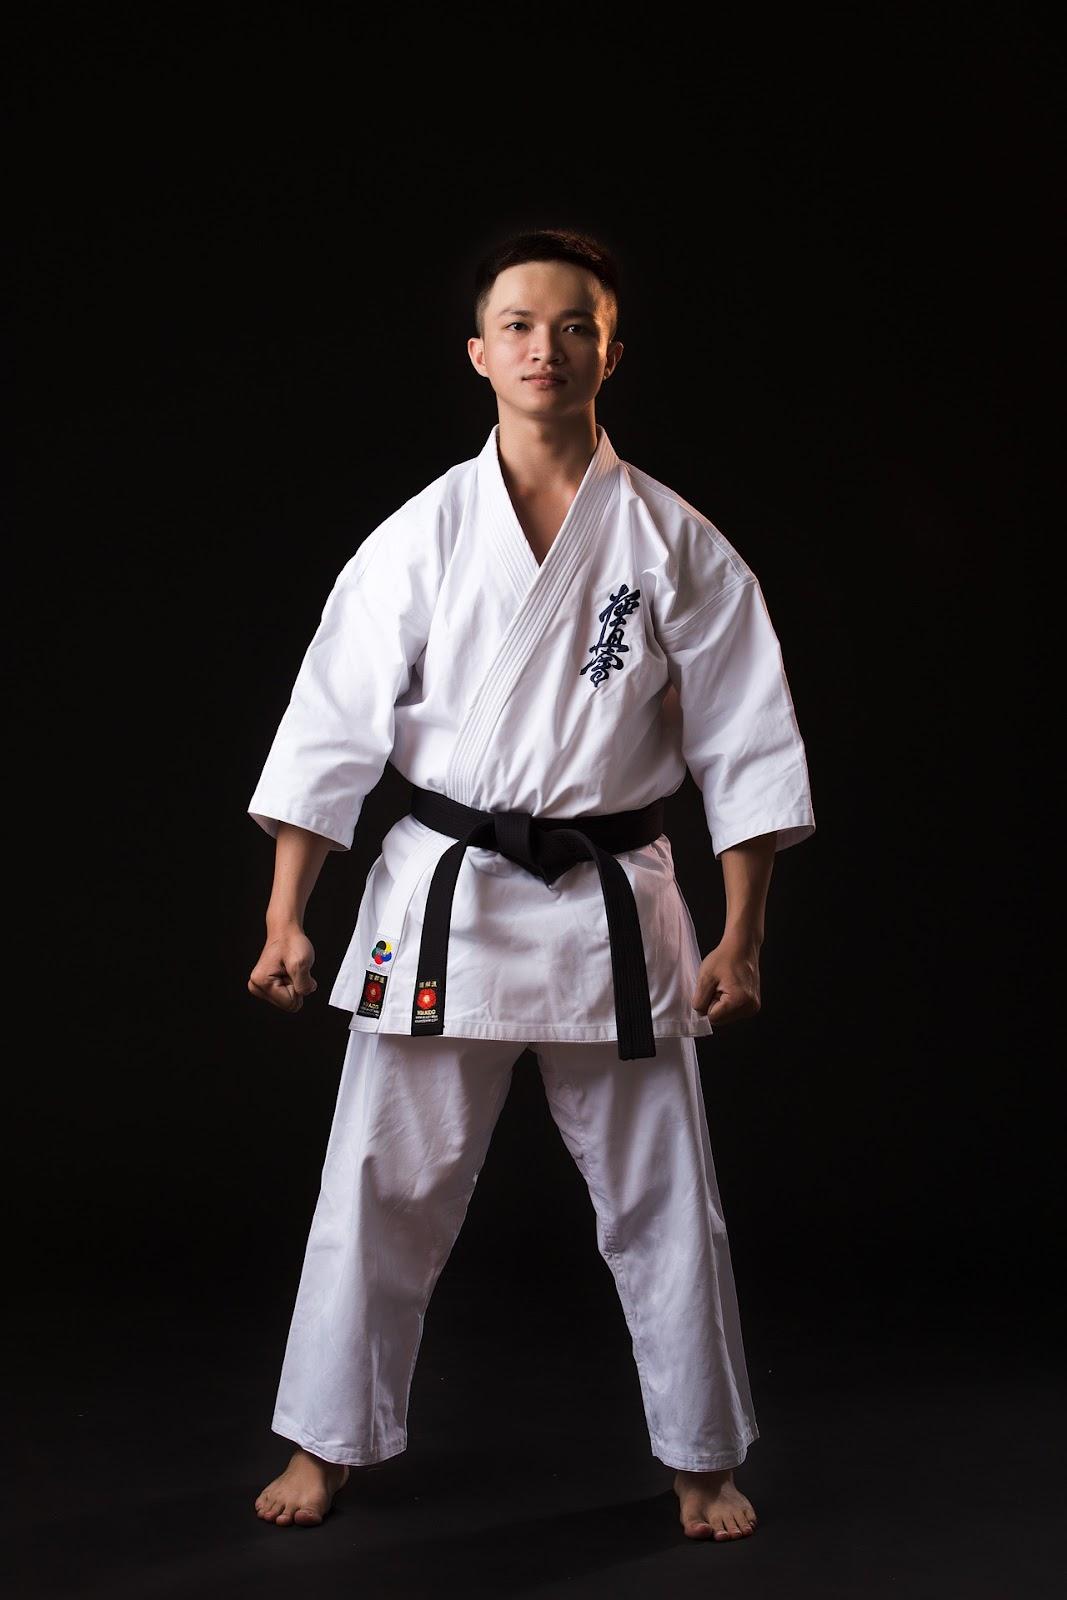 karate stances - basic Karate ready stance